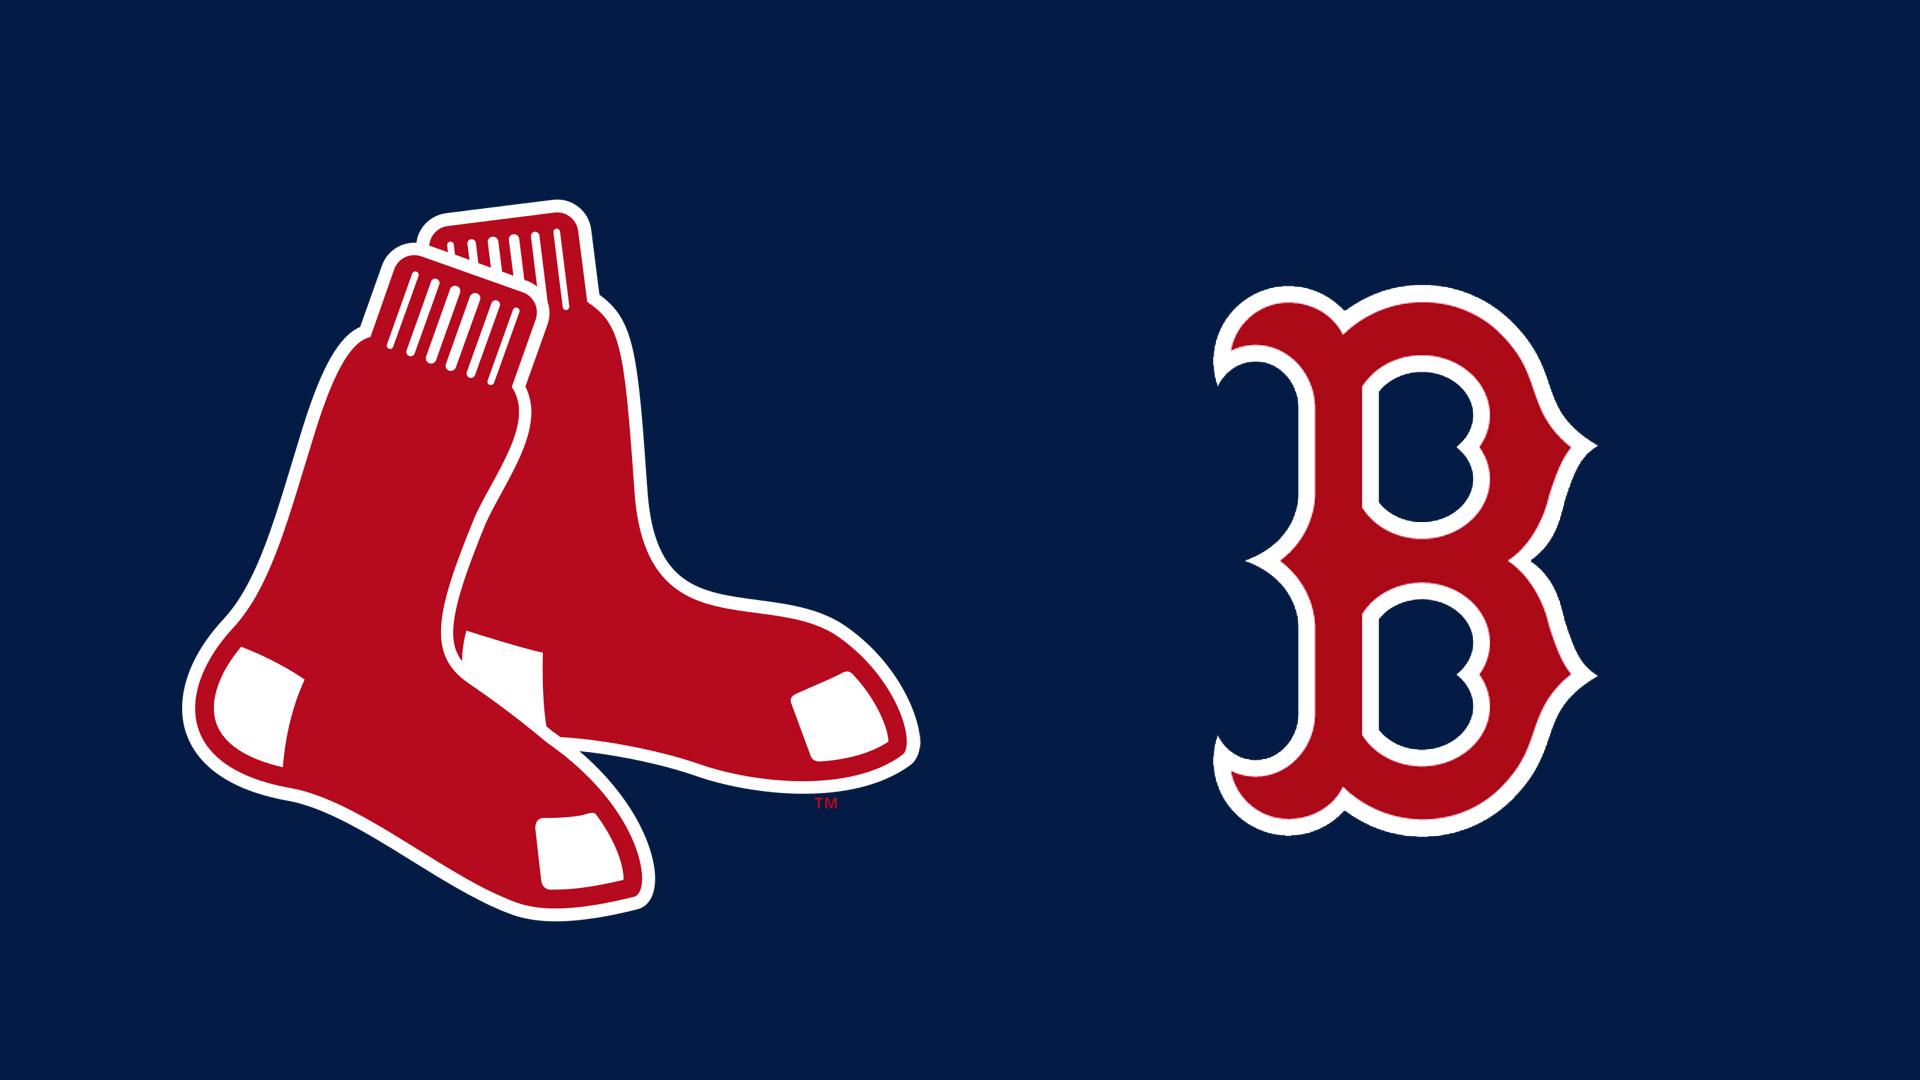 Boston Red Sox Logo Desktop Backgrounds PixelsTalk Wallpapers Amxxcs Wallpaper 1920x1080